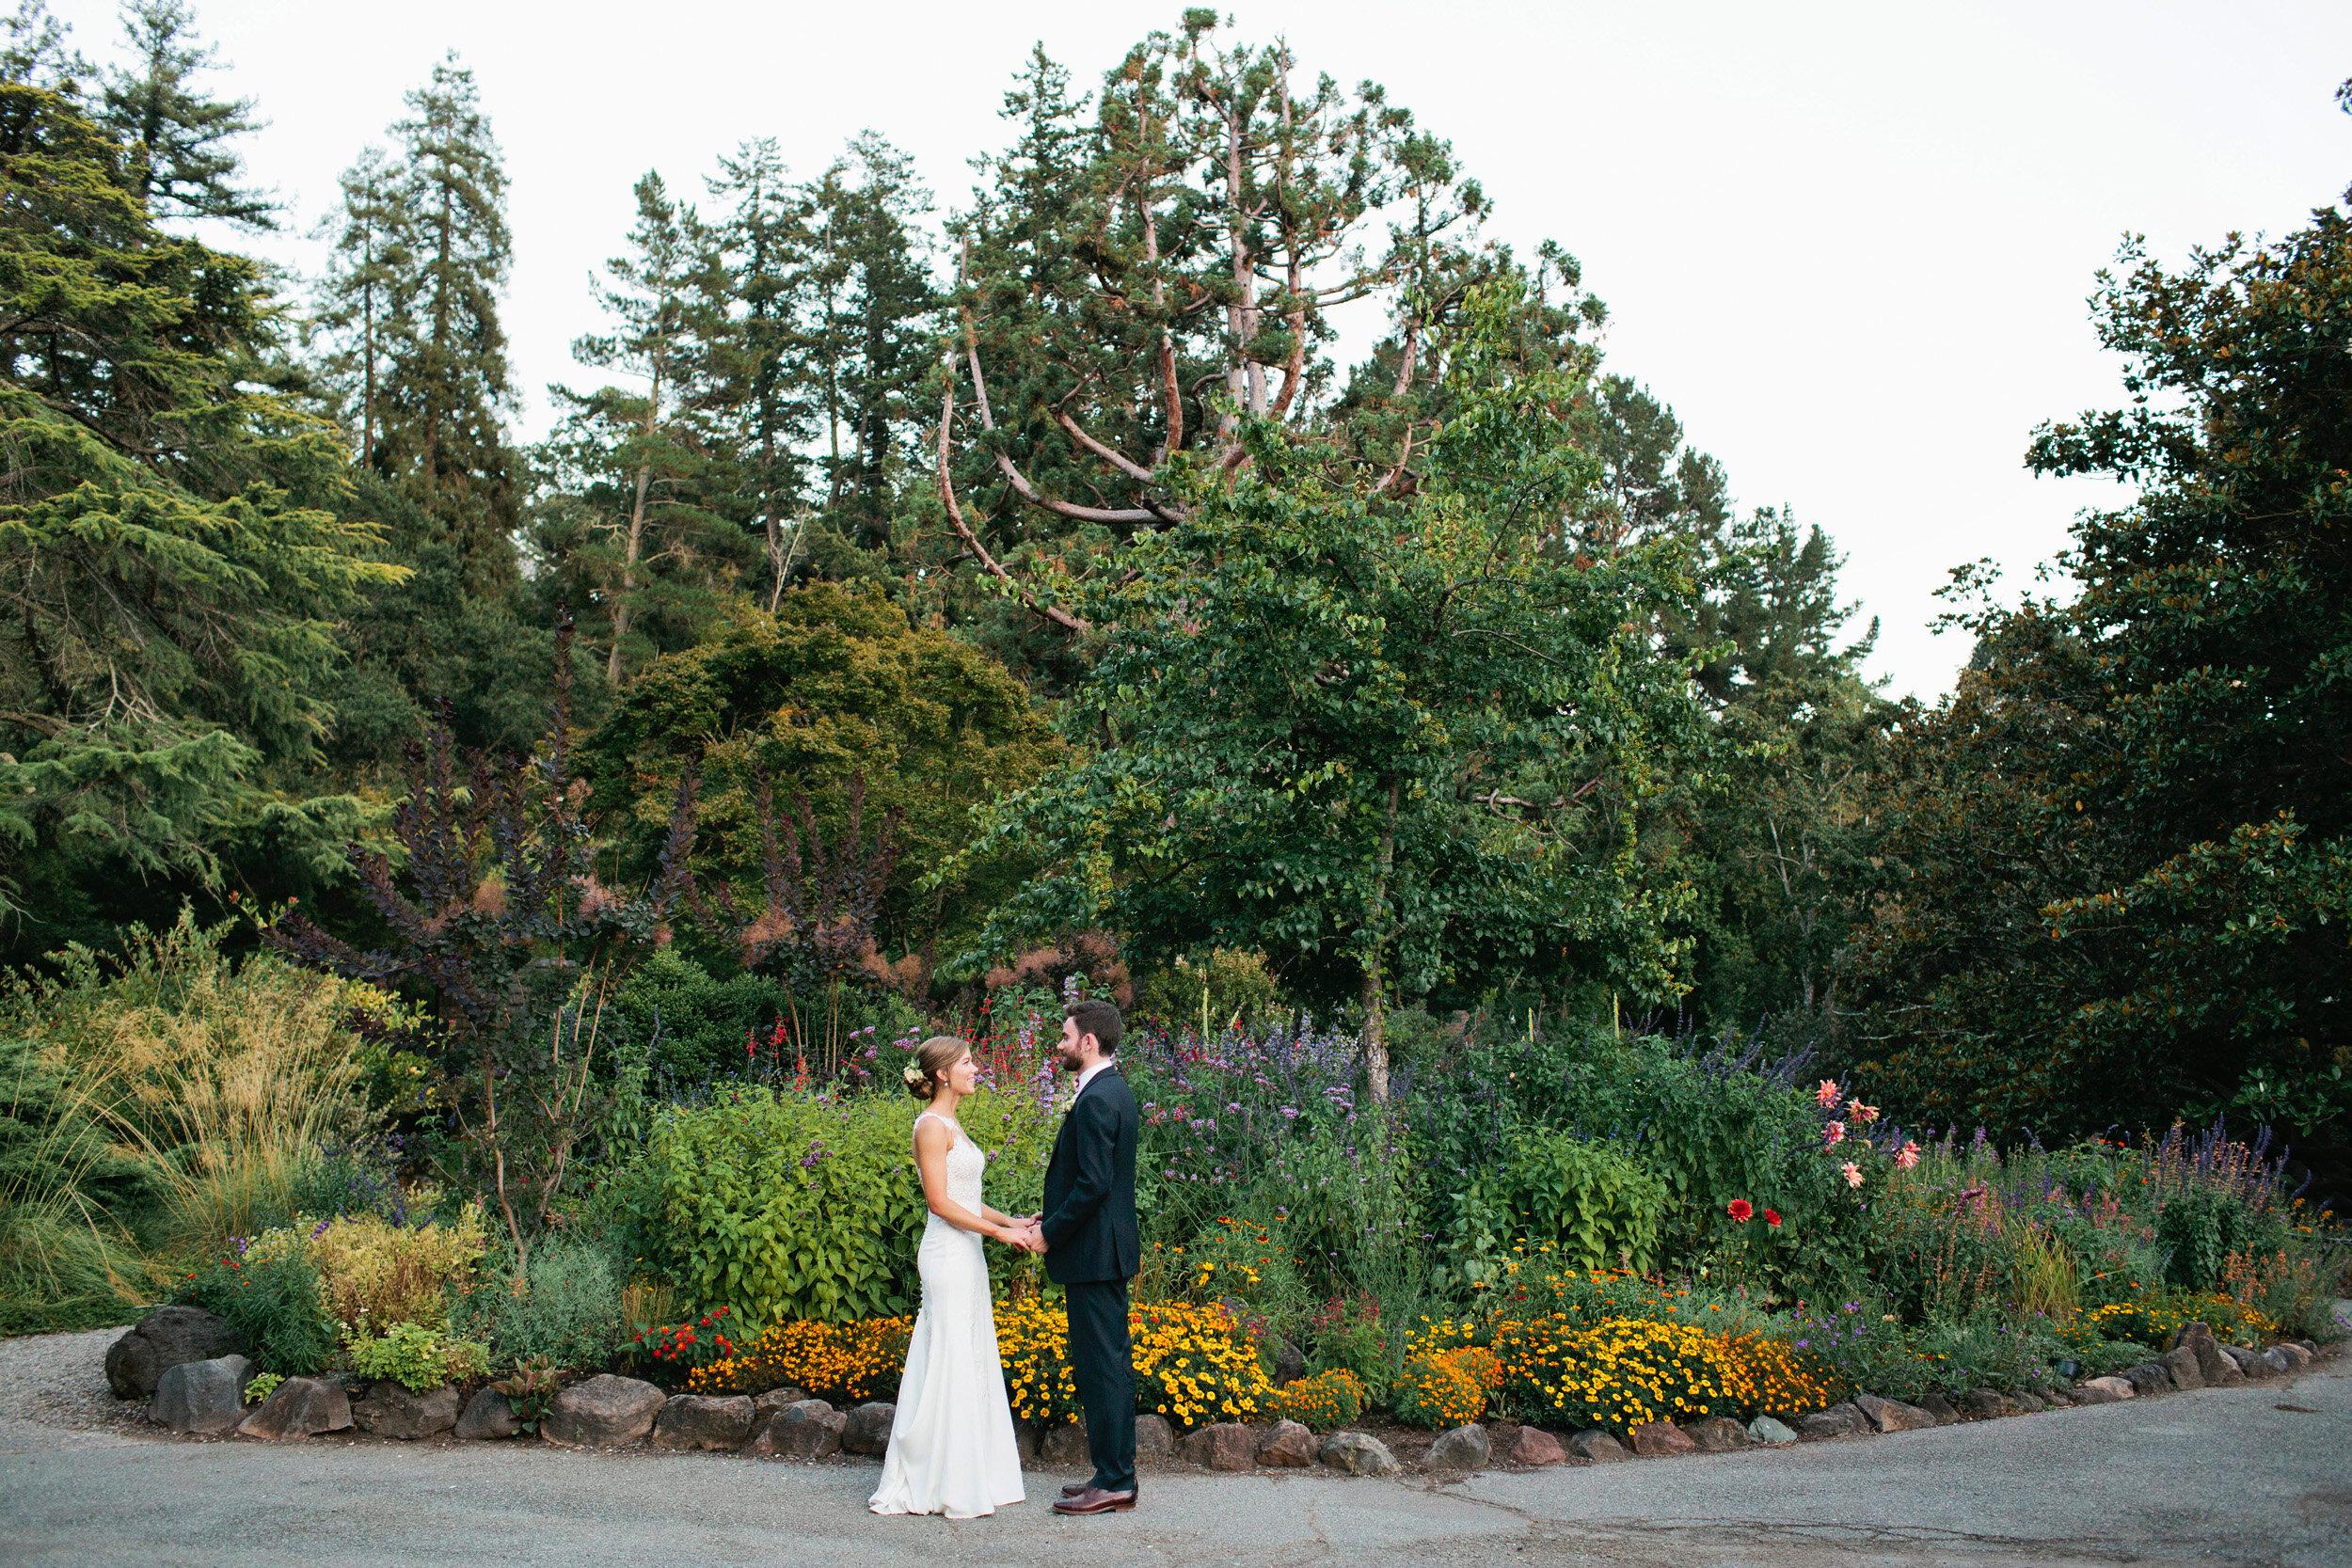 Marin-Art-Garden-Center-Wedding-65.JPG